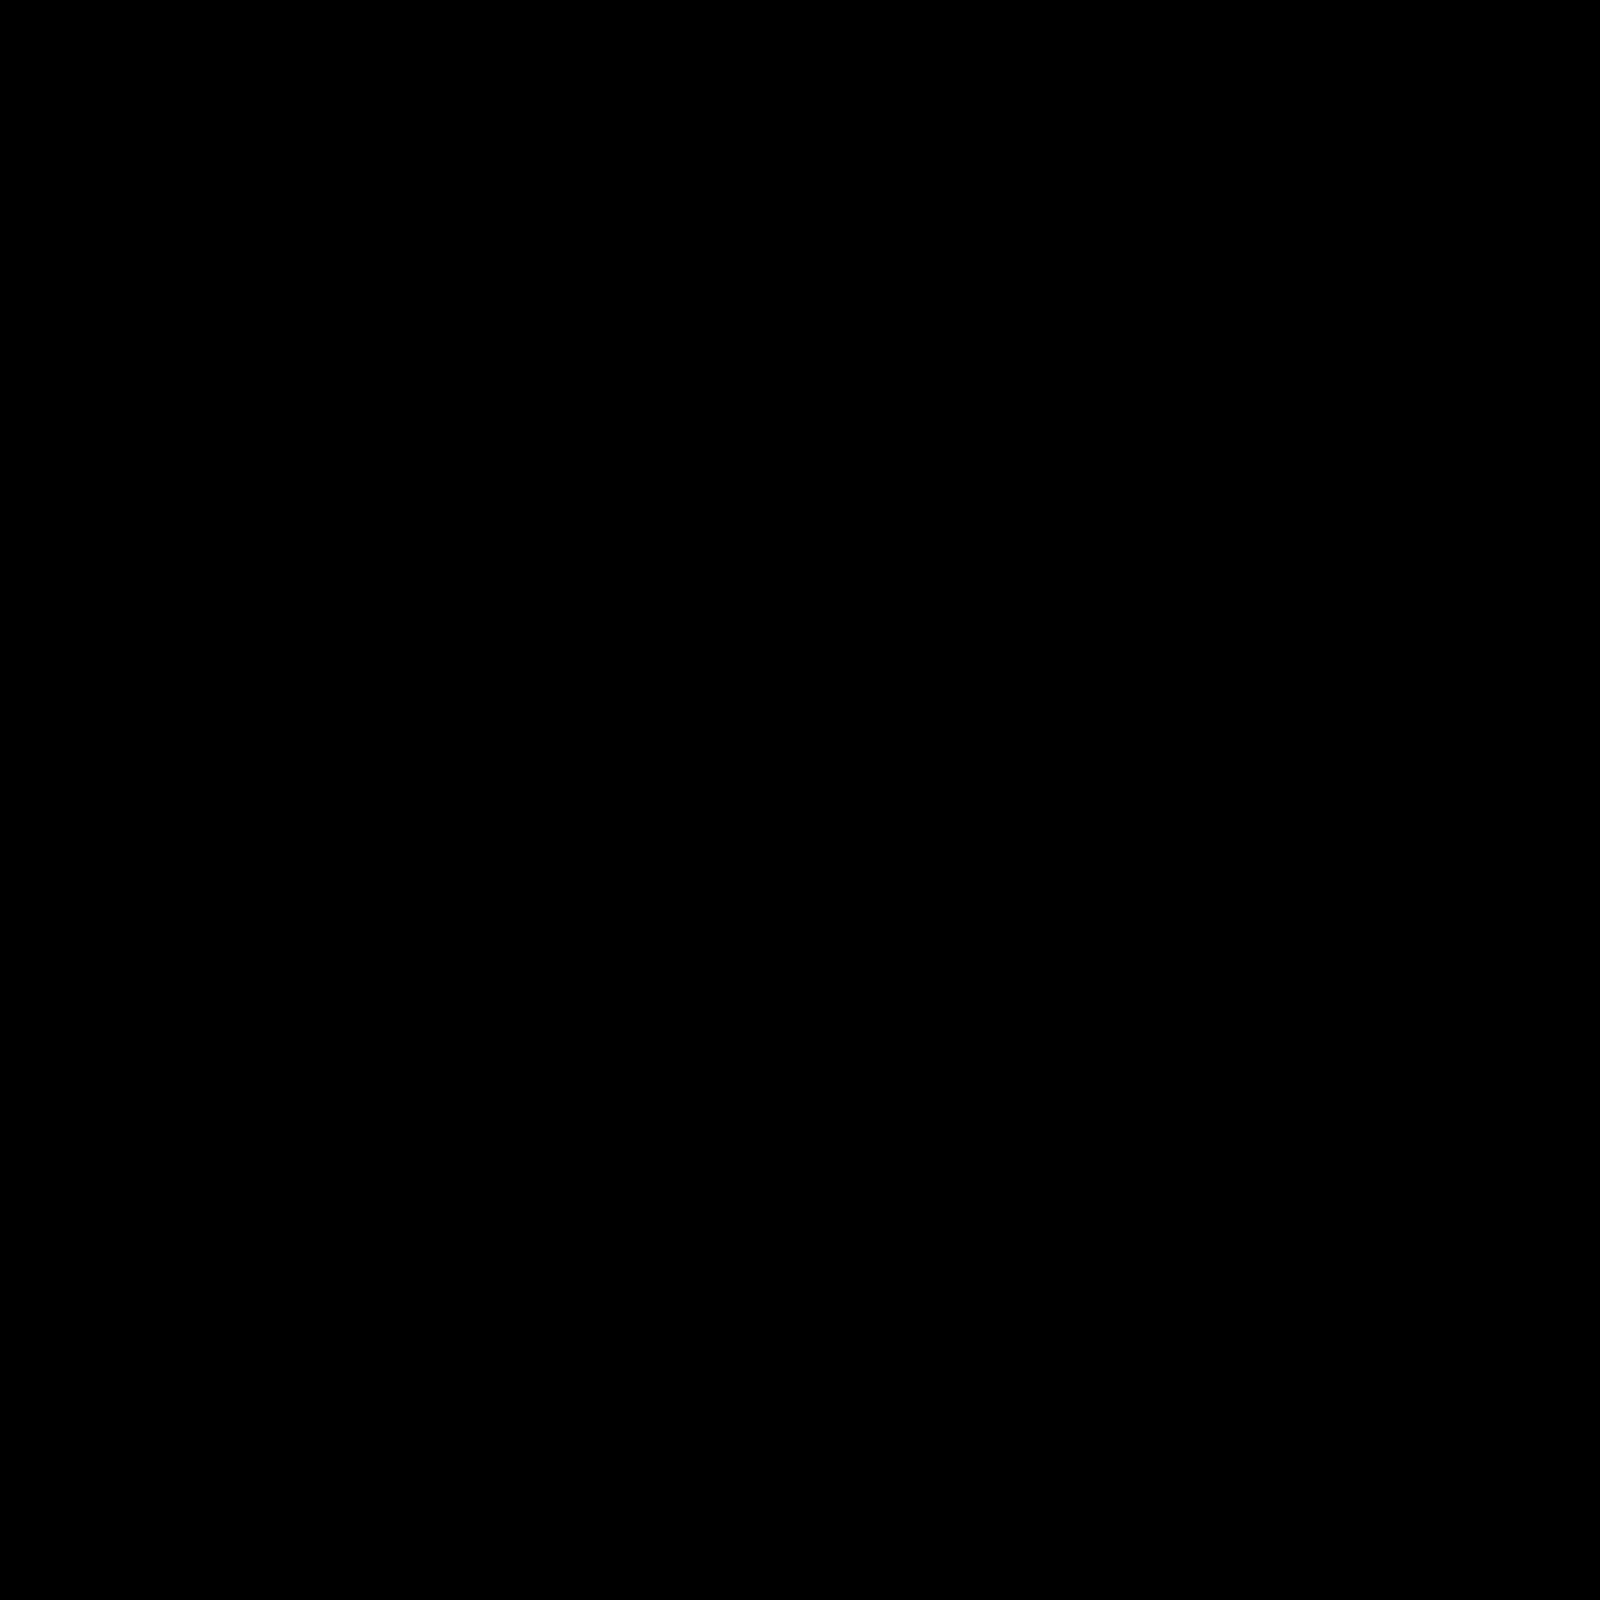 Edytor zdjęć icon